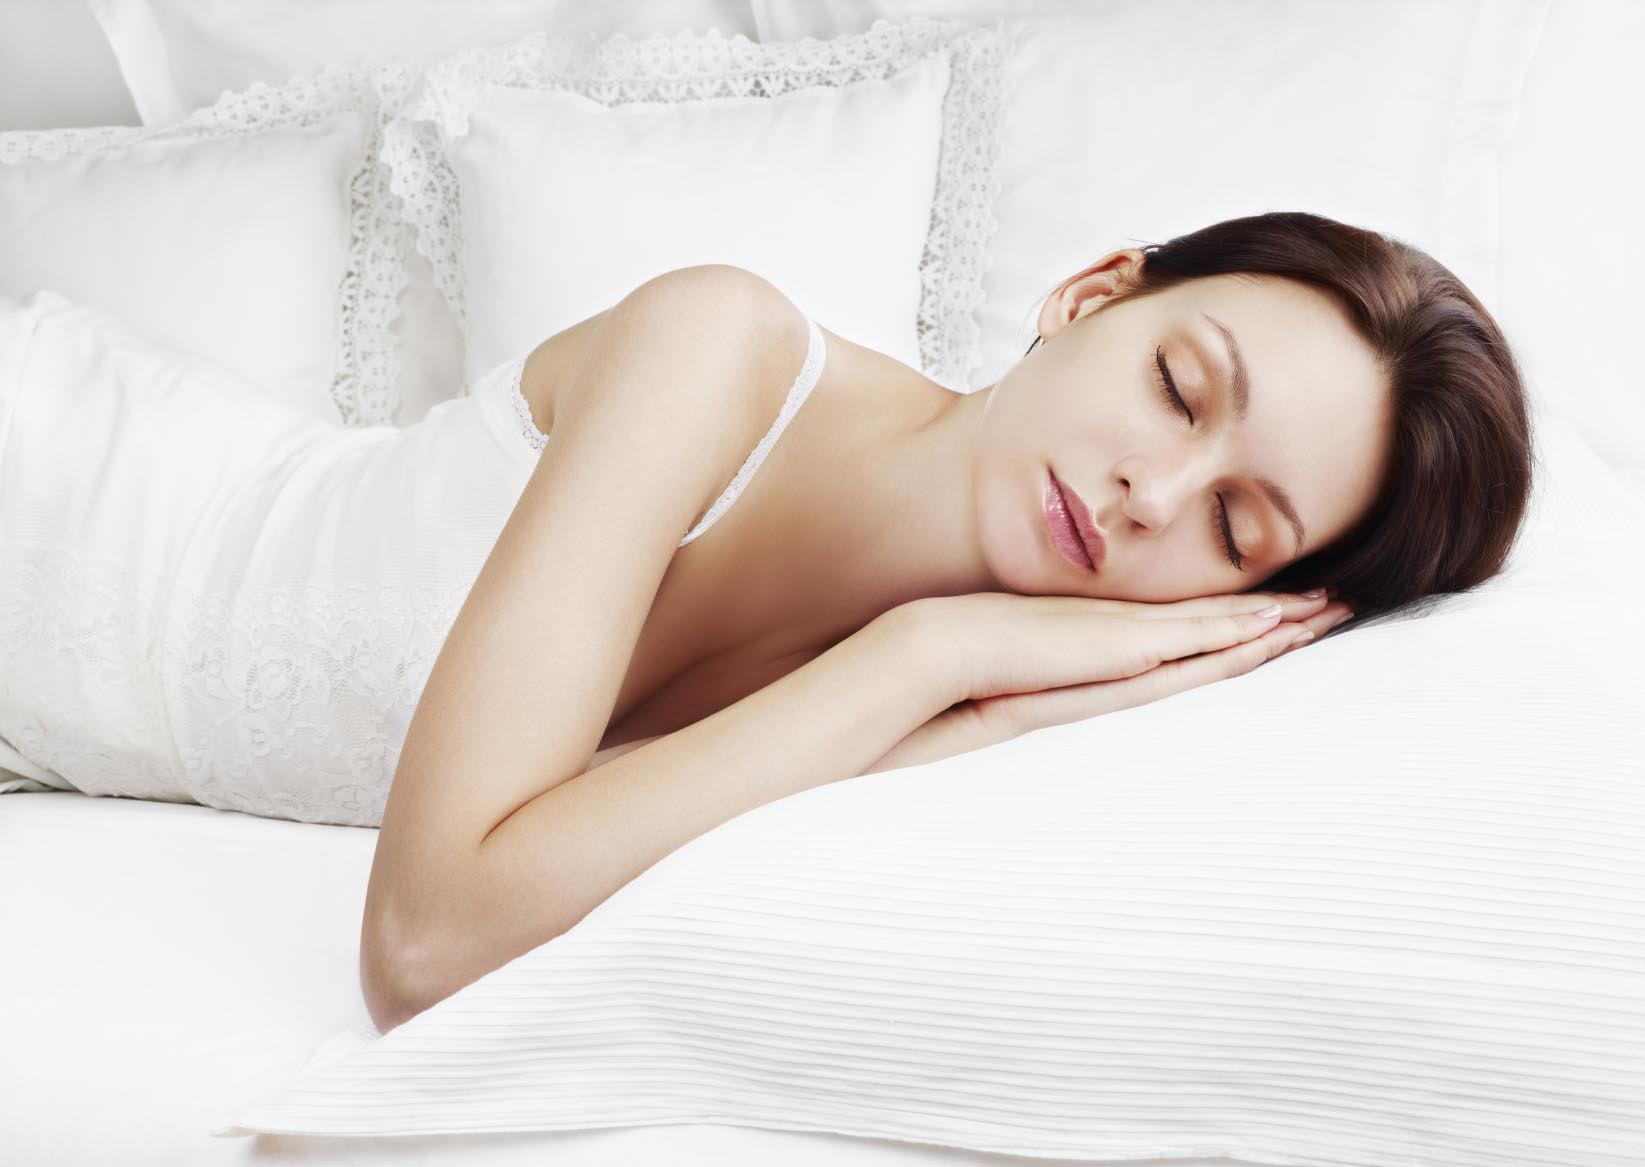 Beautiful woman sleeping on white bed linen